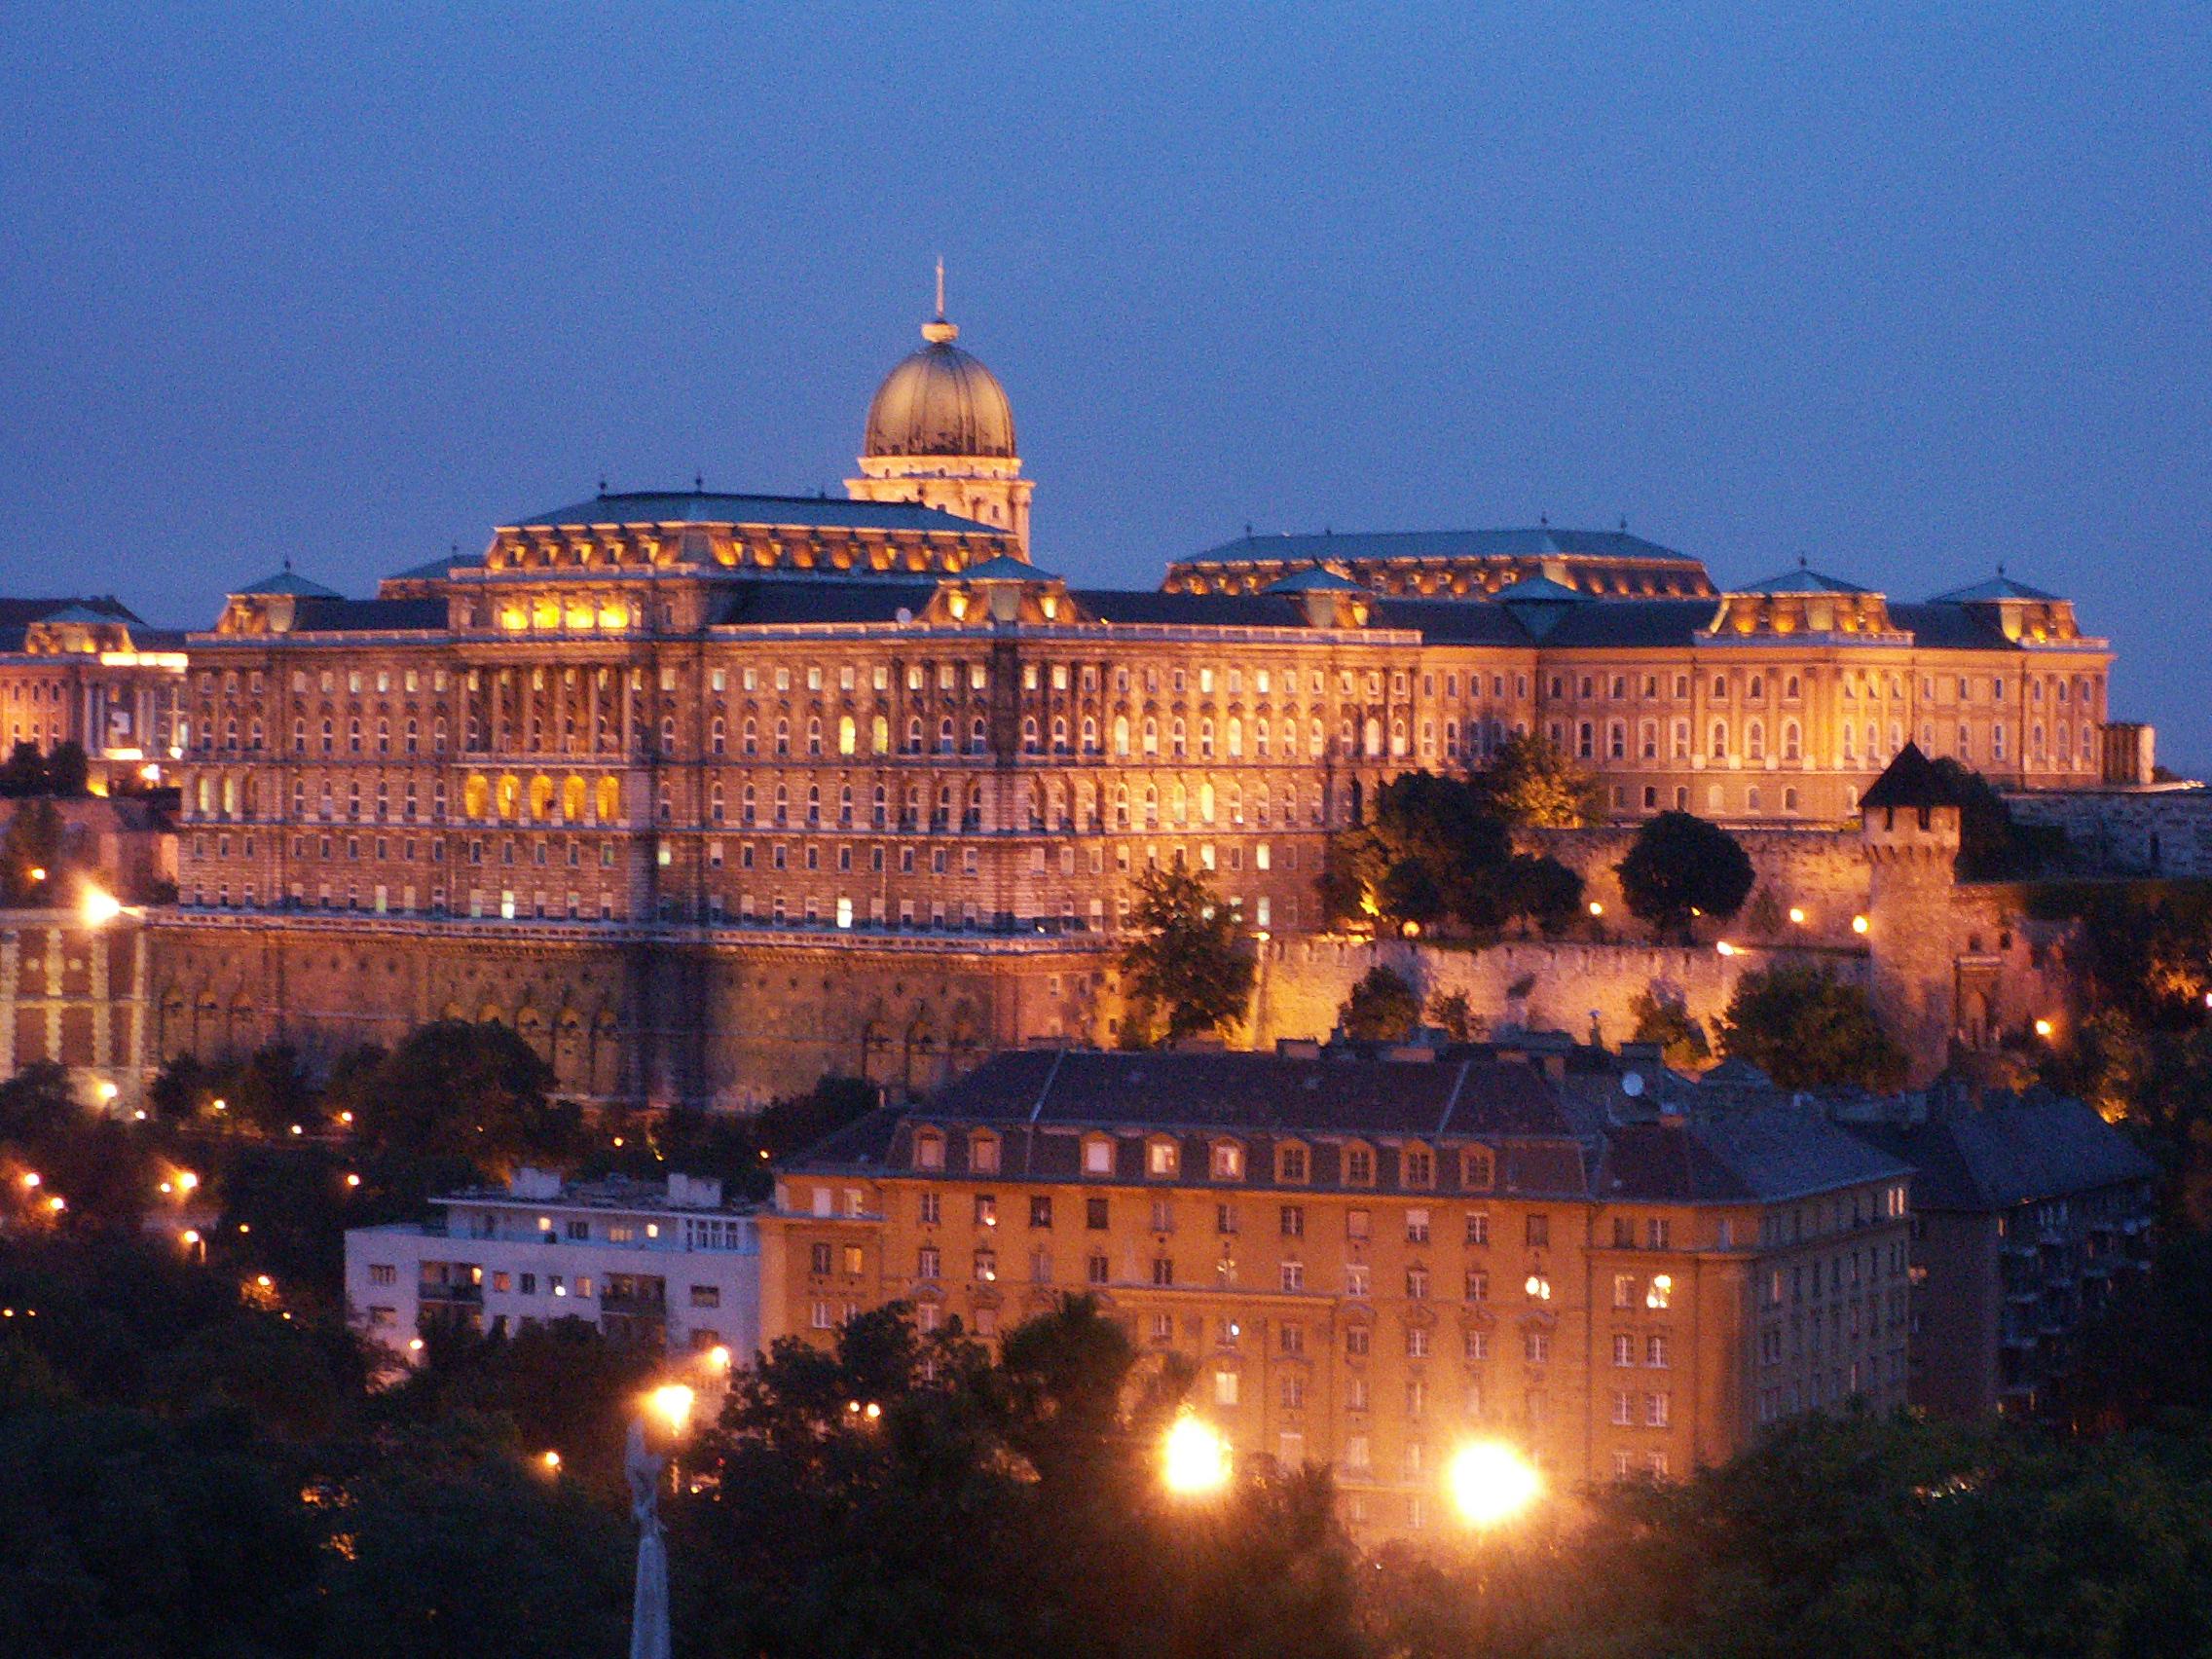 Castillo de Buda de noche